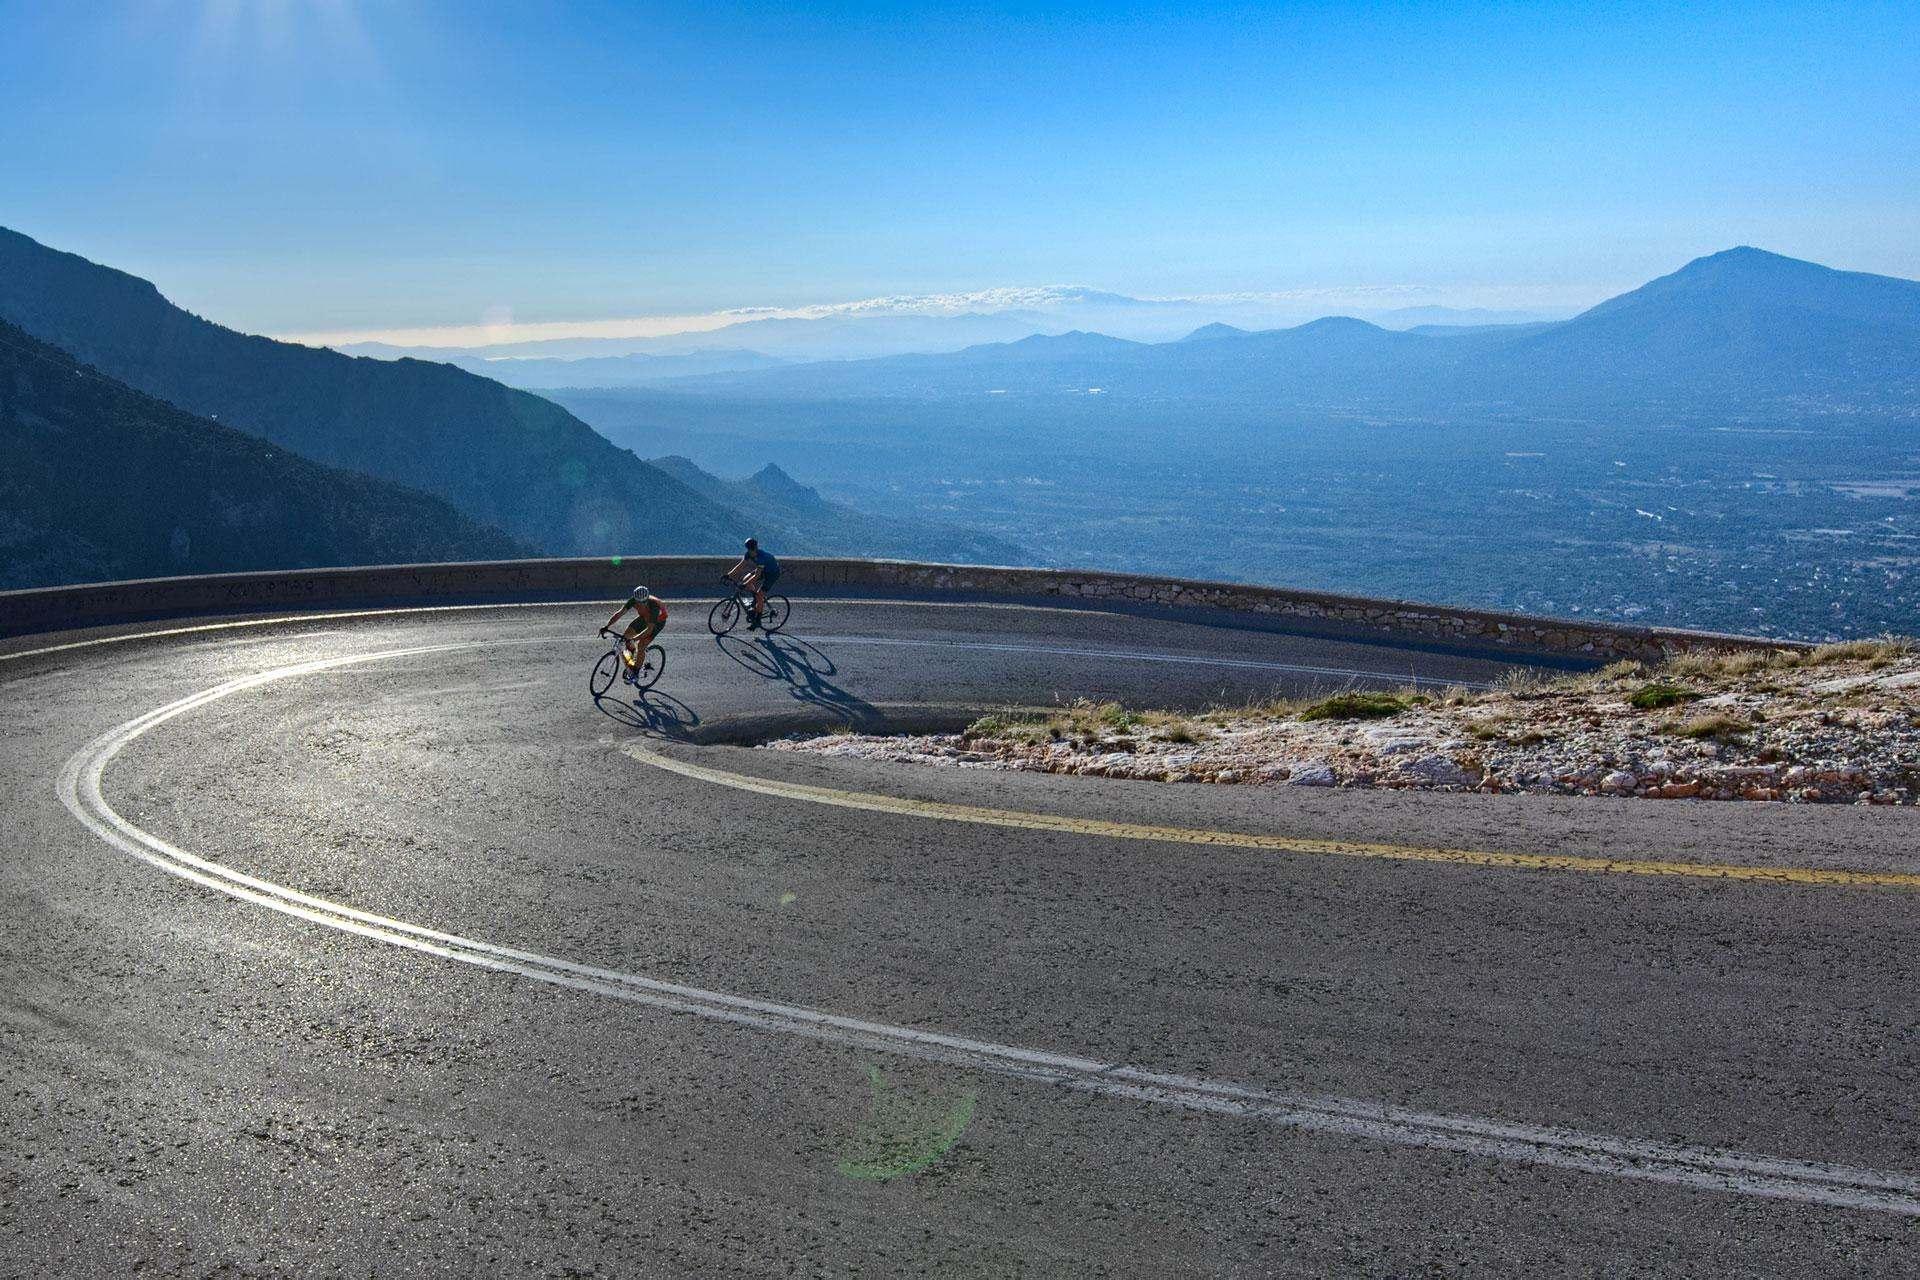 Road Cycling in Athens - Climbing mountain Parnitha - Gr Cycling